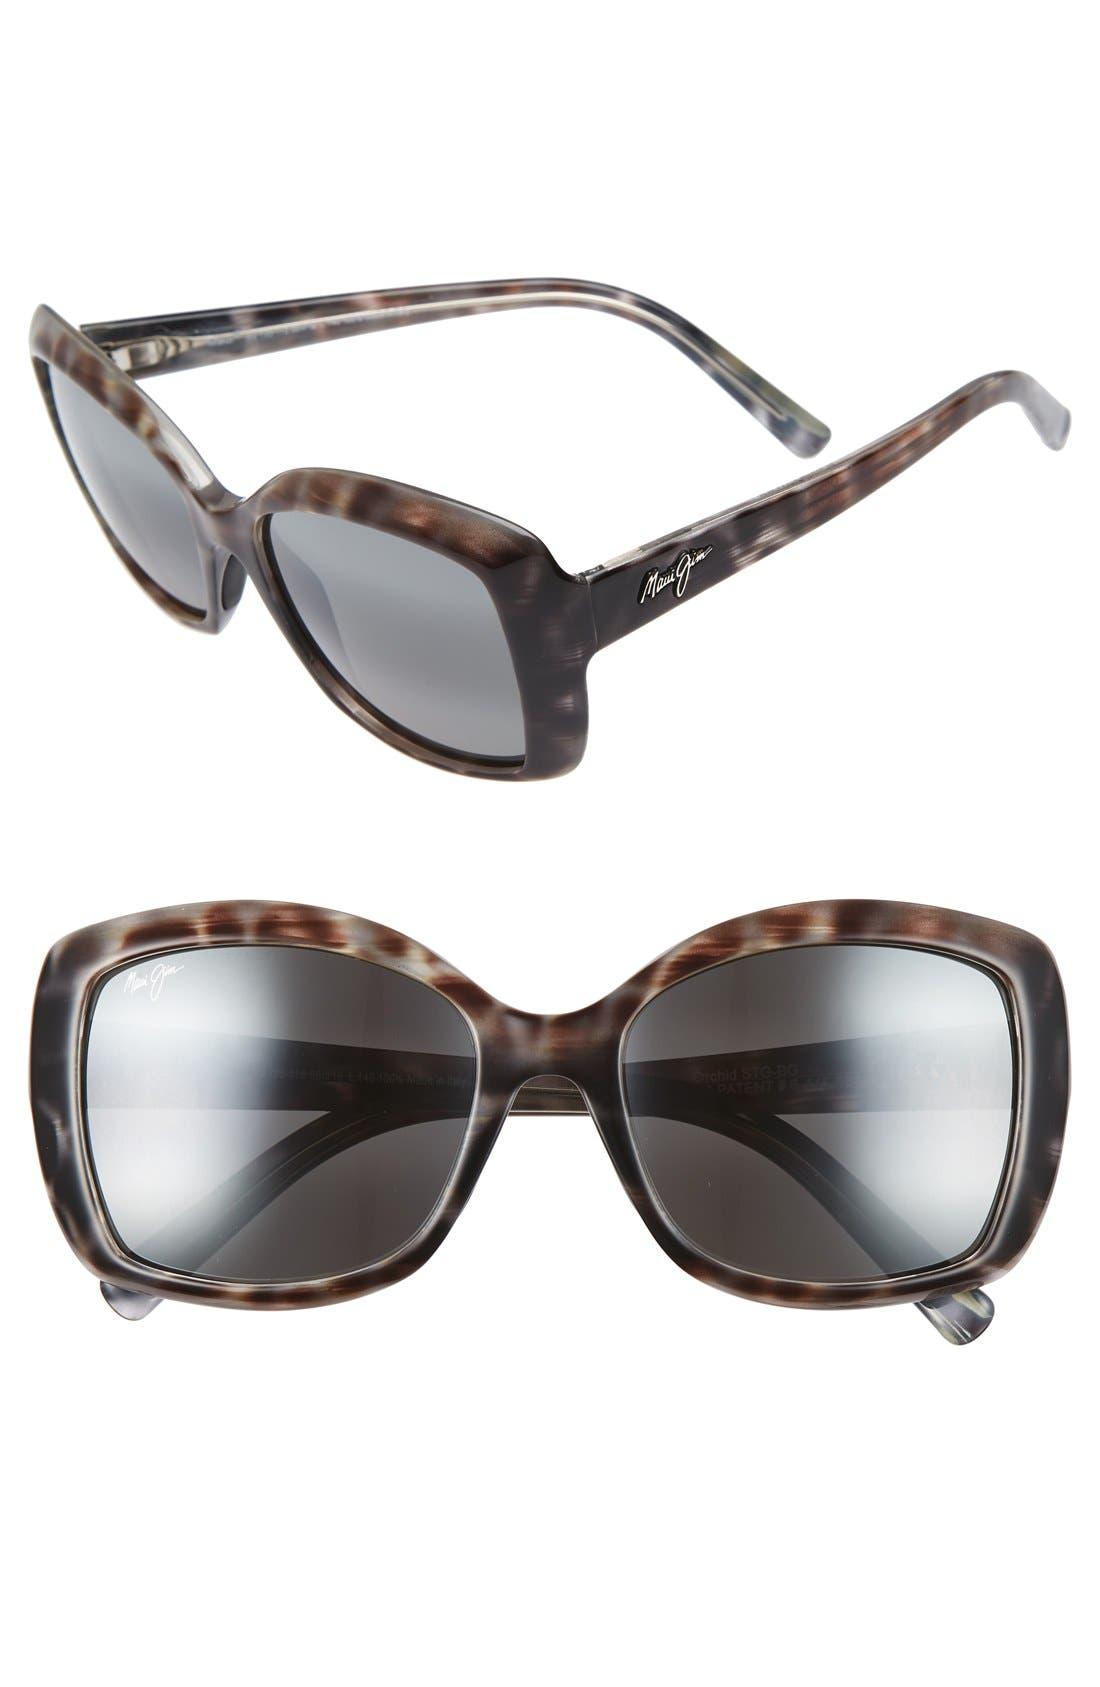 Maui Jim Orchid 5m Polarizedplus2 Sunglasses -